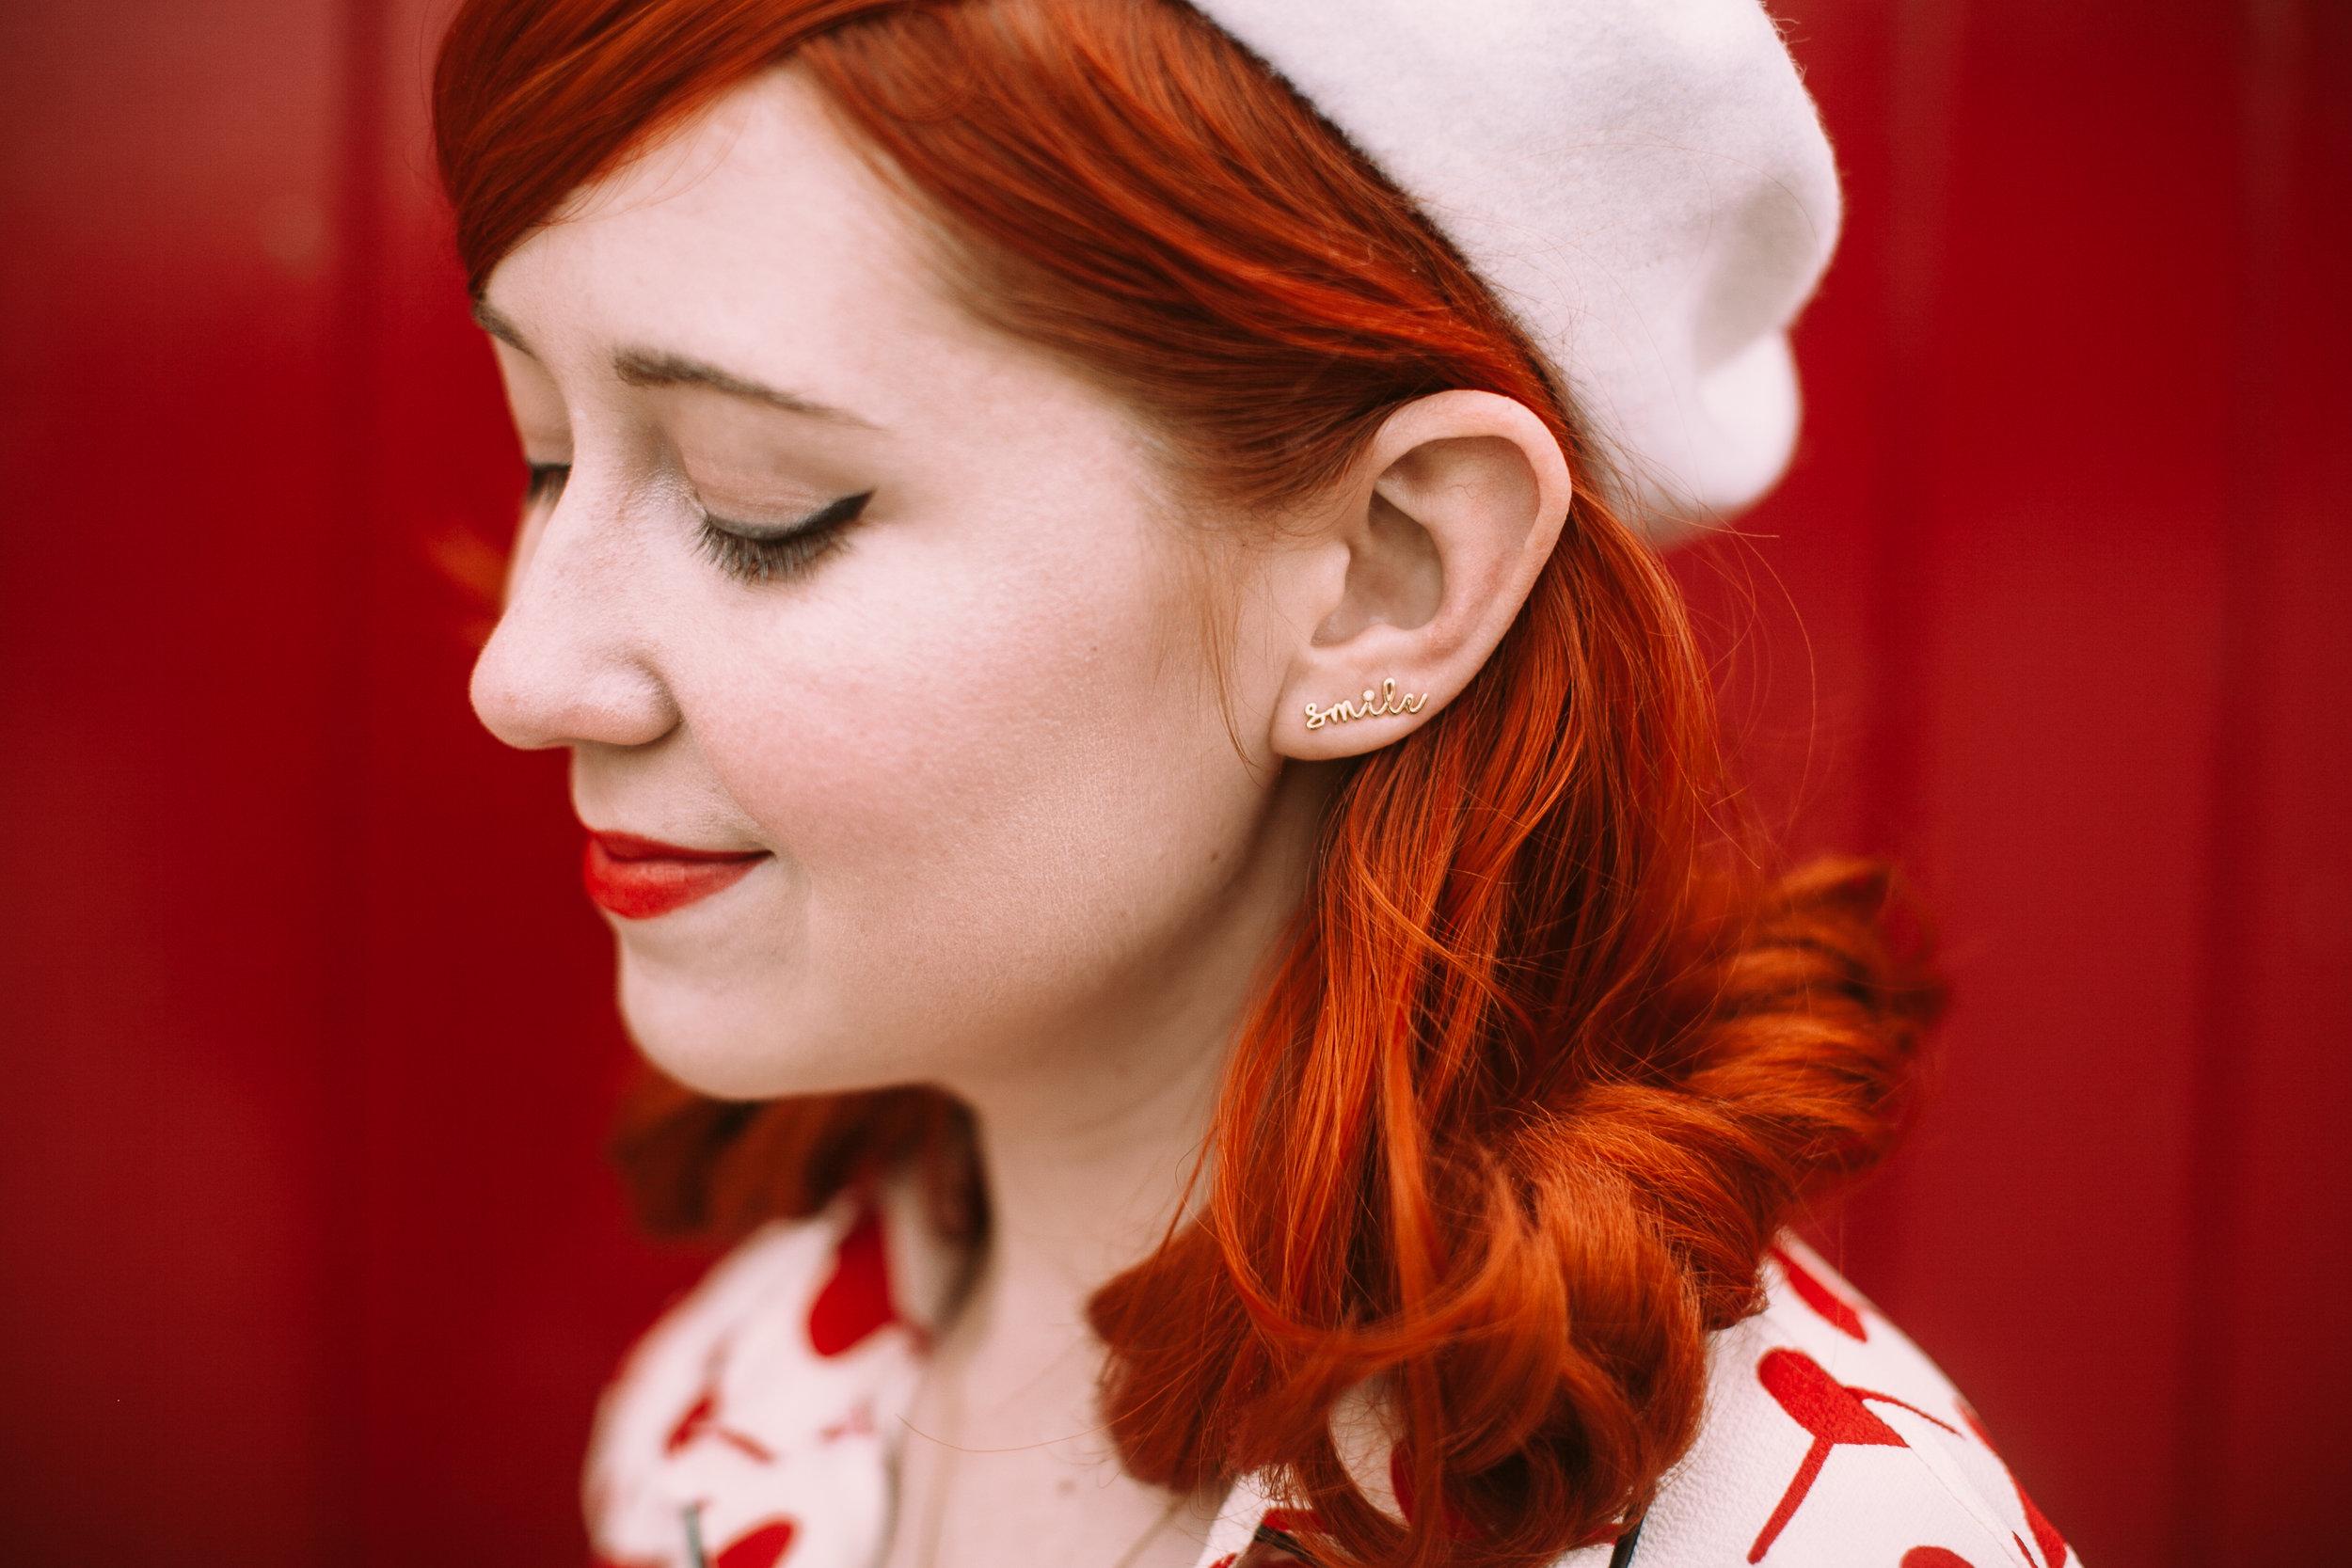 Lee Renee Diamond 'Smile' slider earring